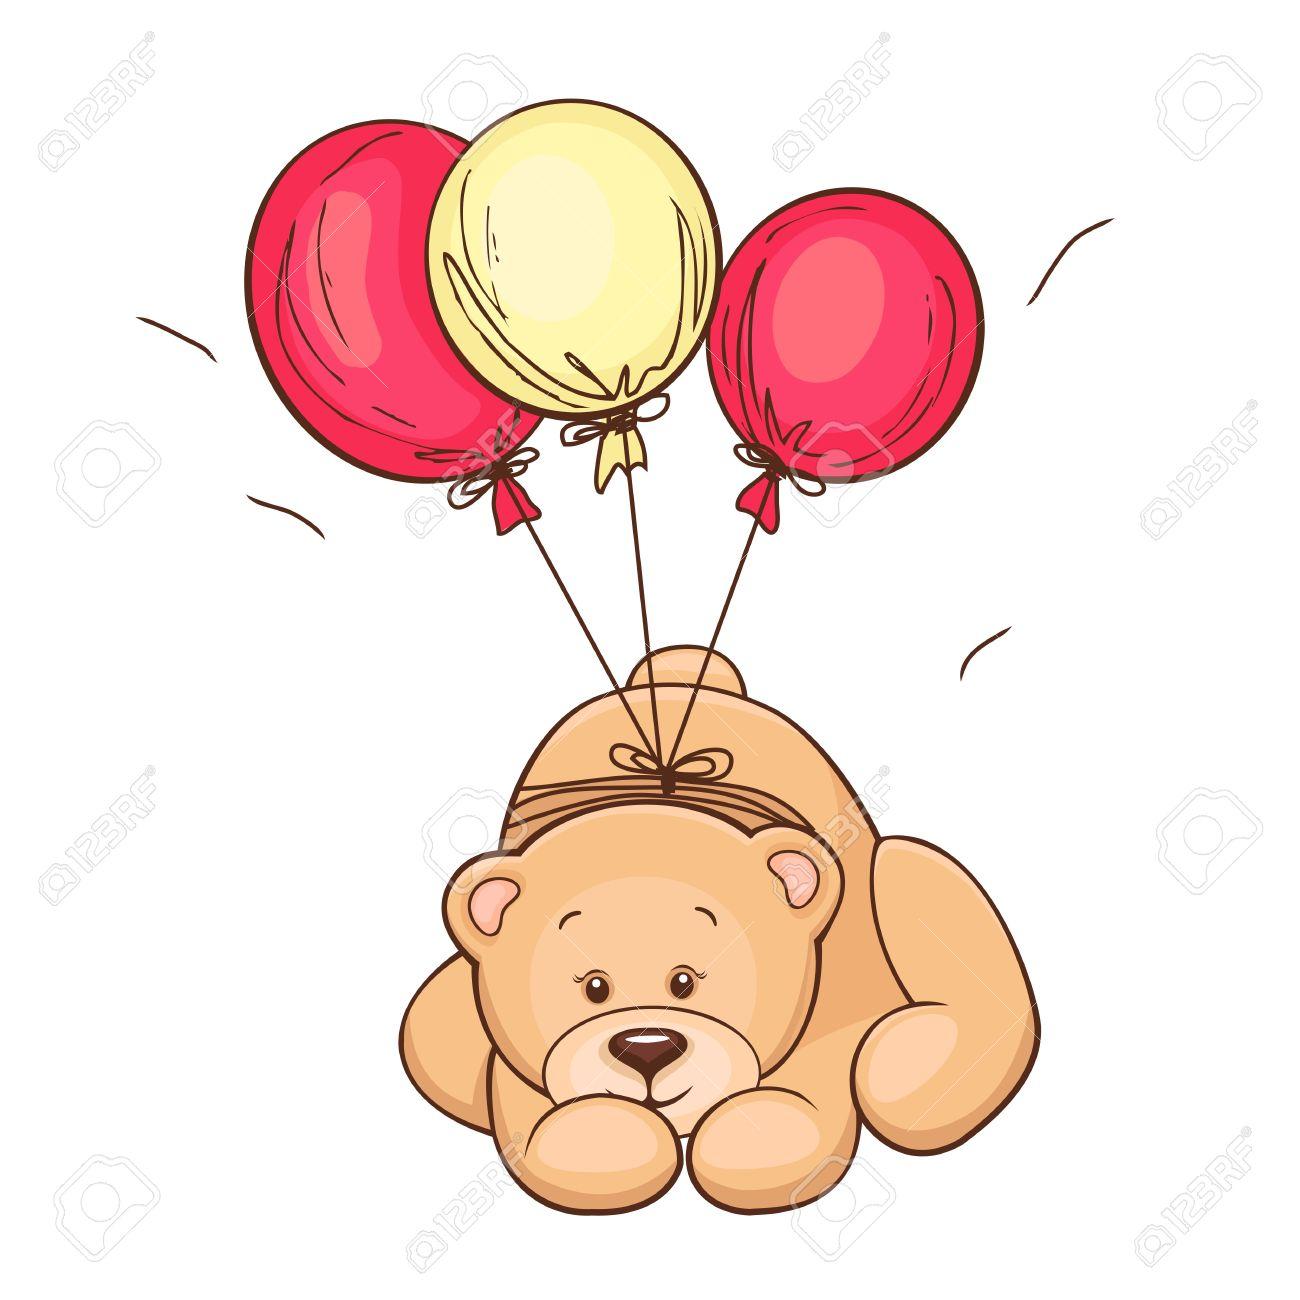 Hand drawn cute Teddy Bear and balloons  Vector illustration Stock Vector - 12863461